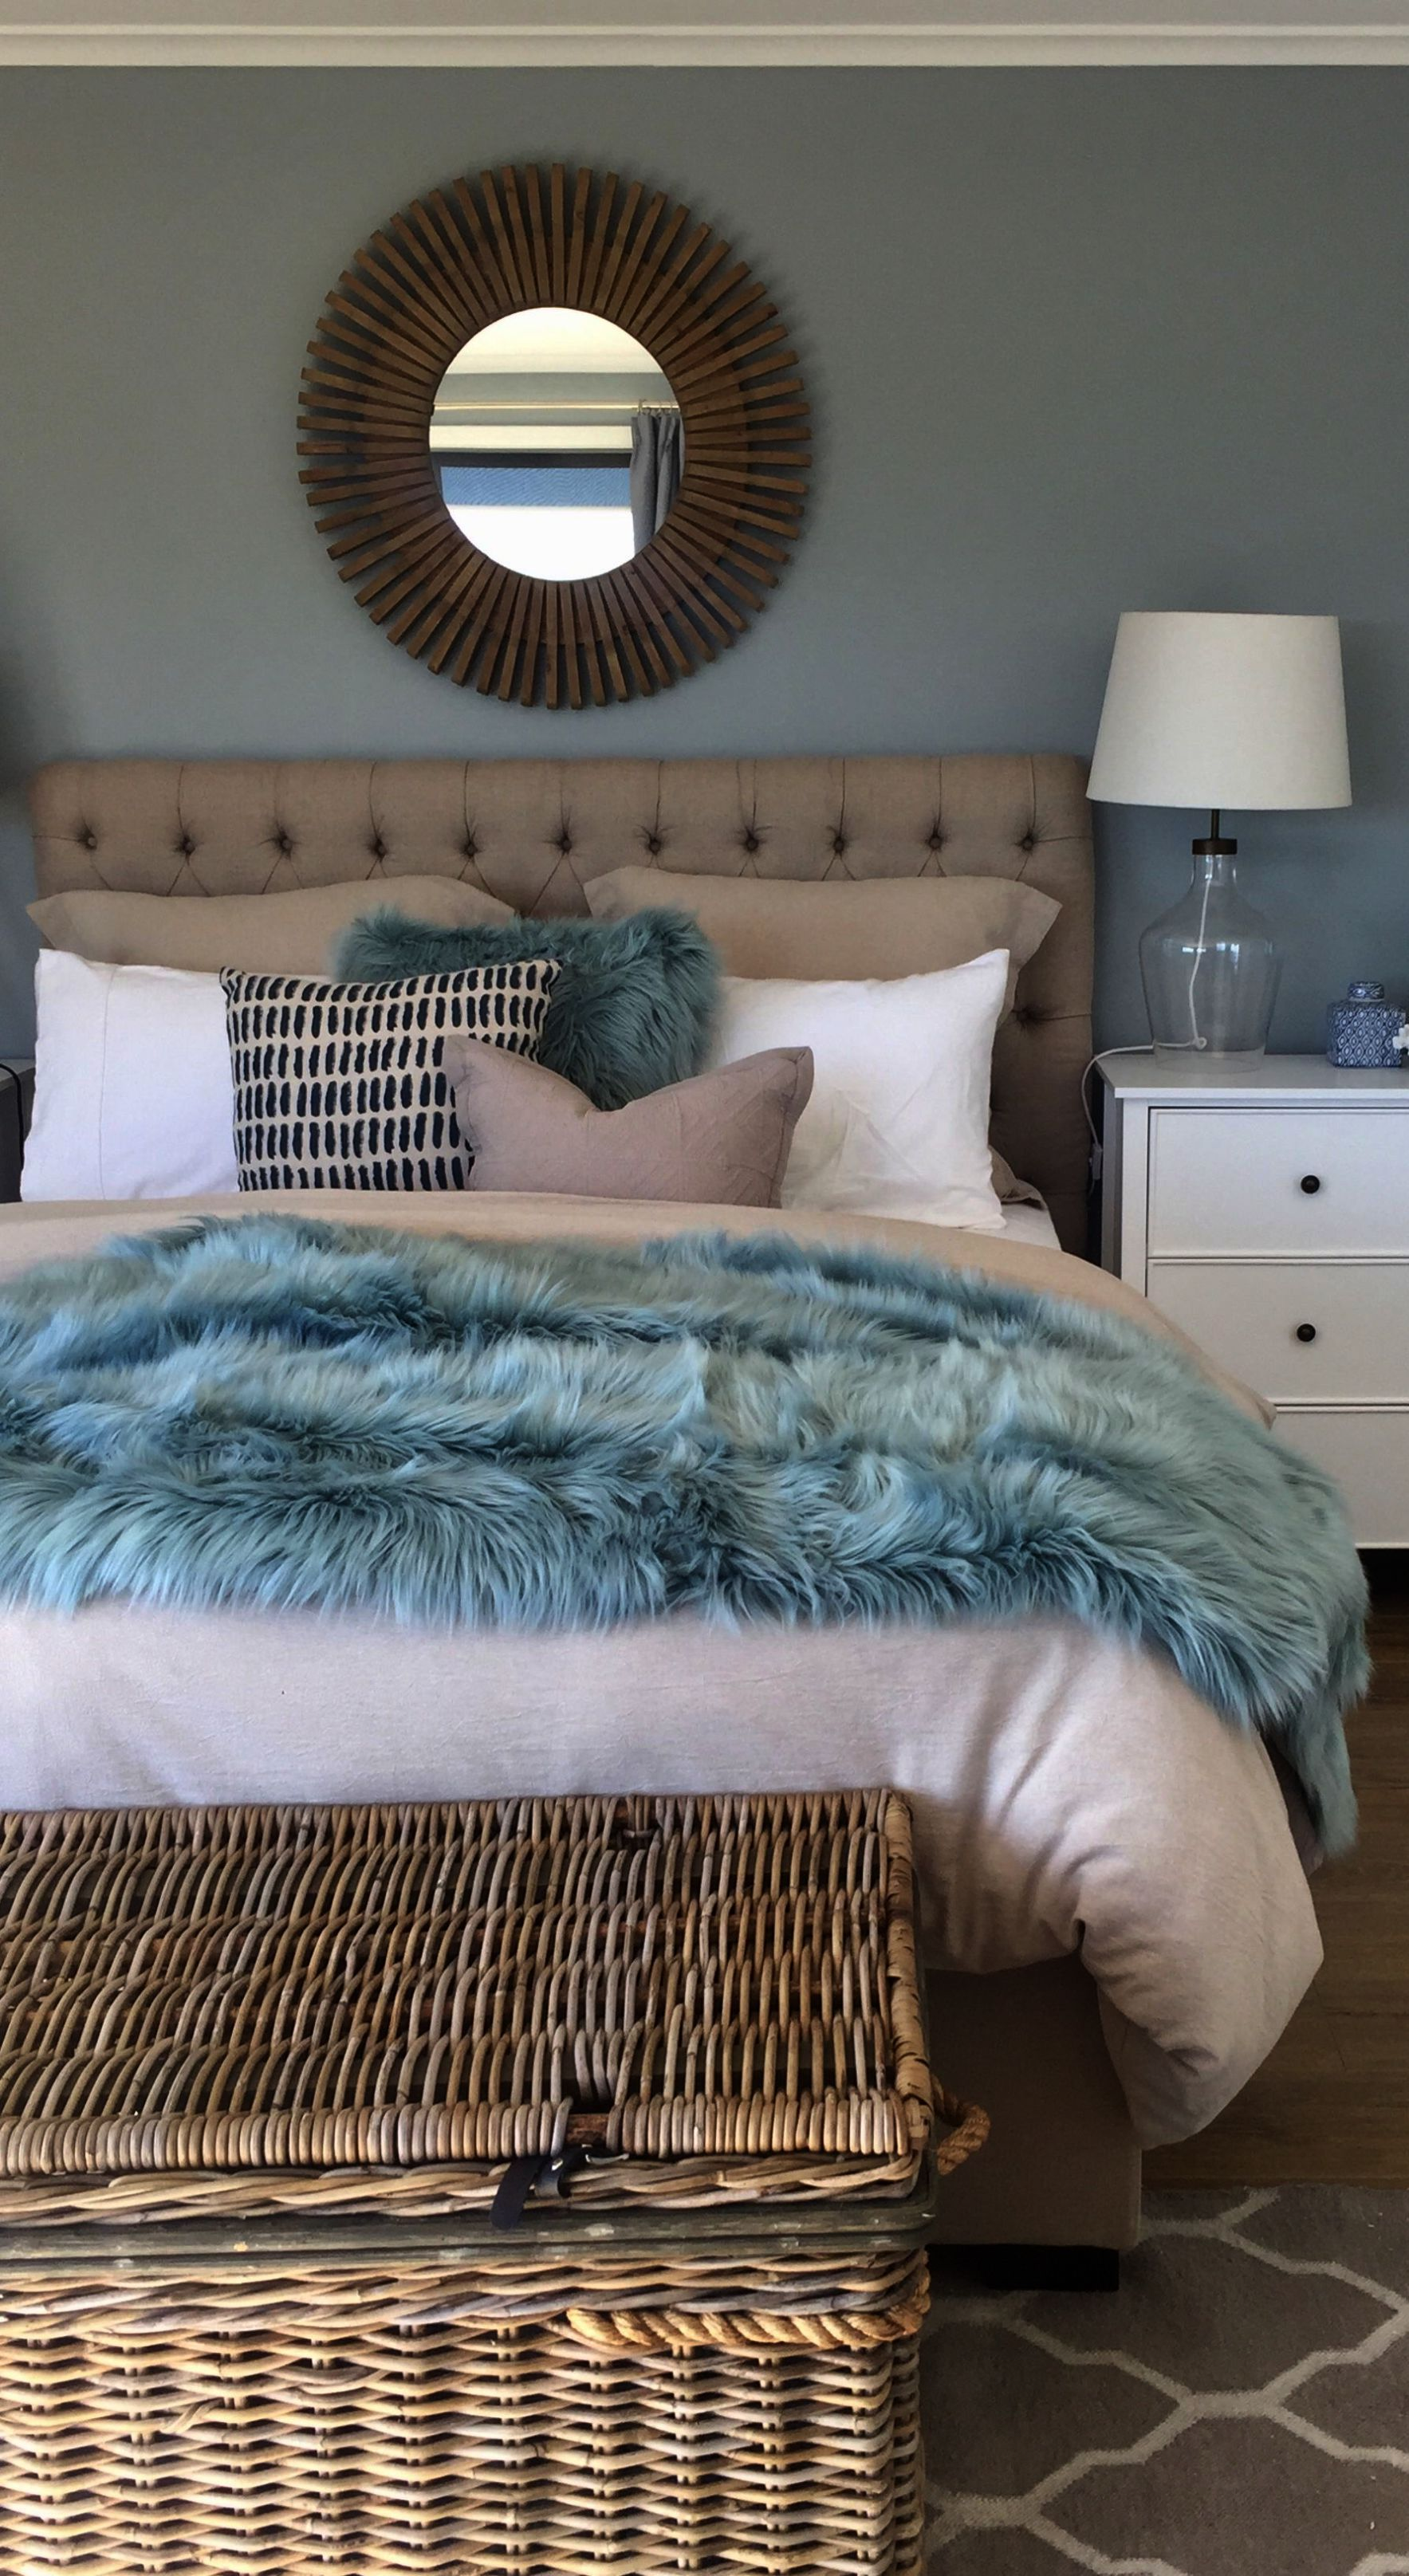 Home Decor Hawaiian Style, Home Decor Ideas Black Furniture Few Home Decor Trends 2019 Hgtv